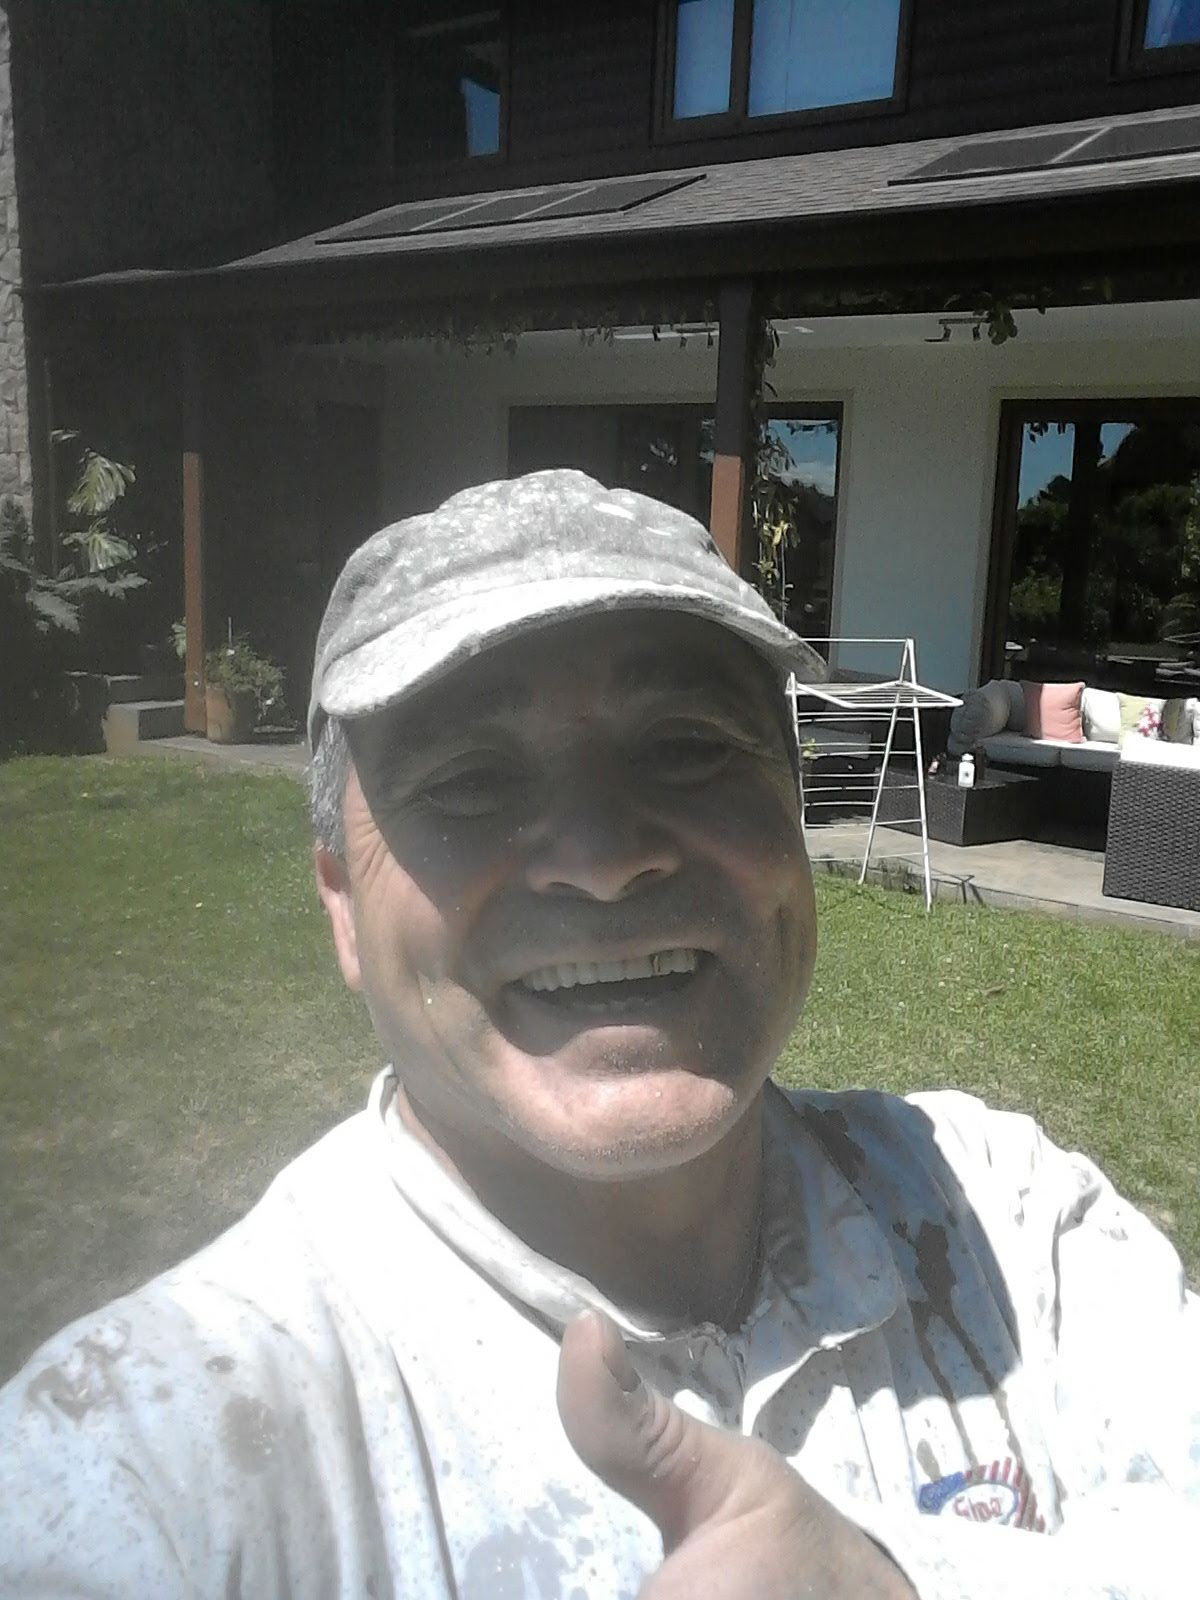 Daniel Cruces Gonzalez